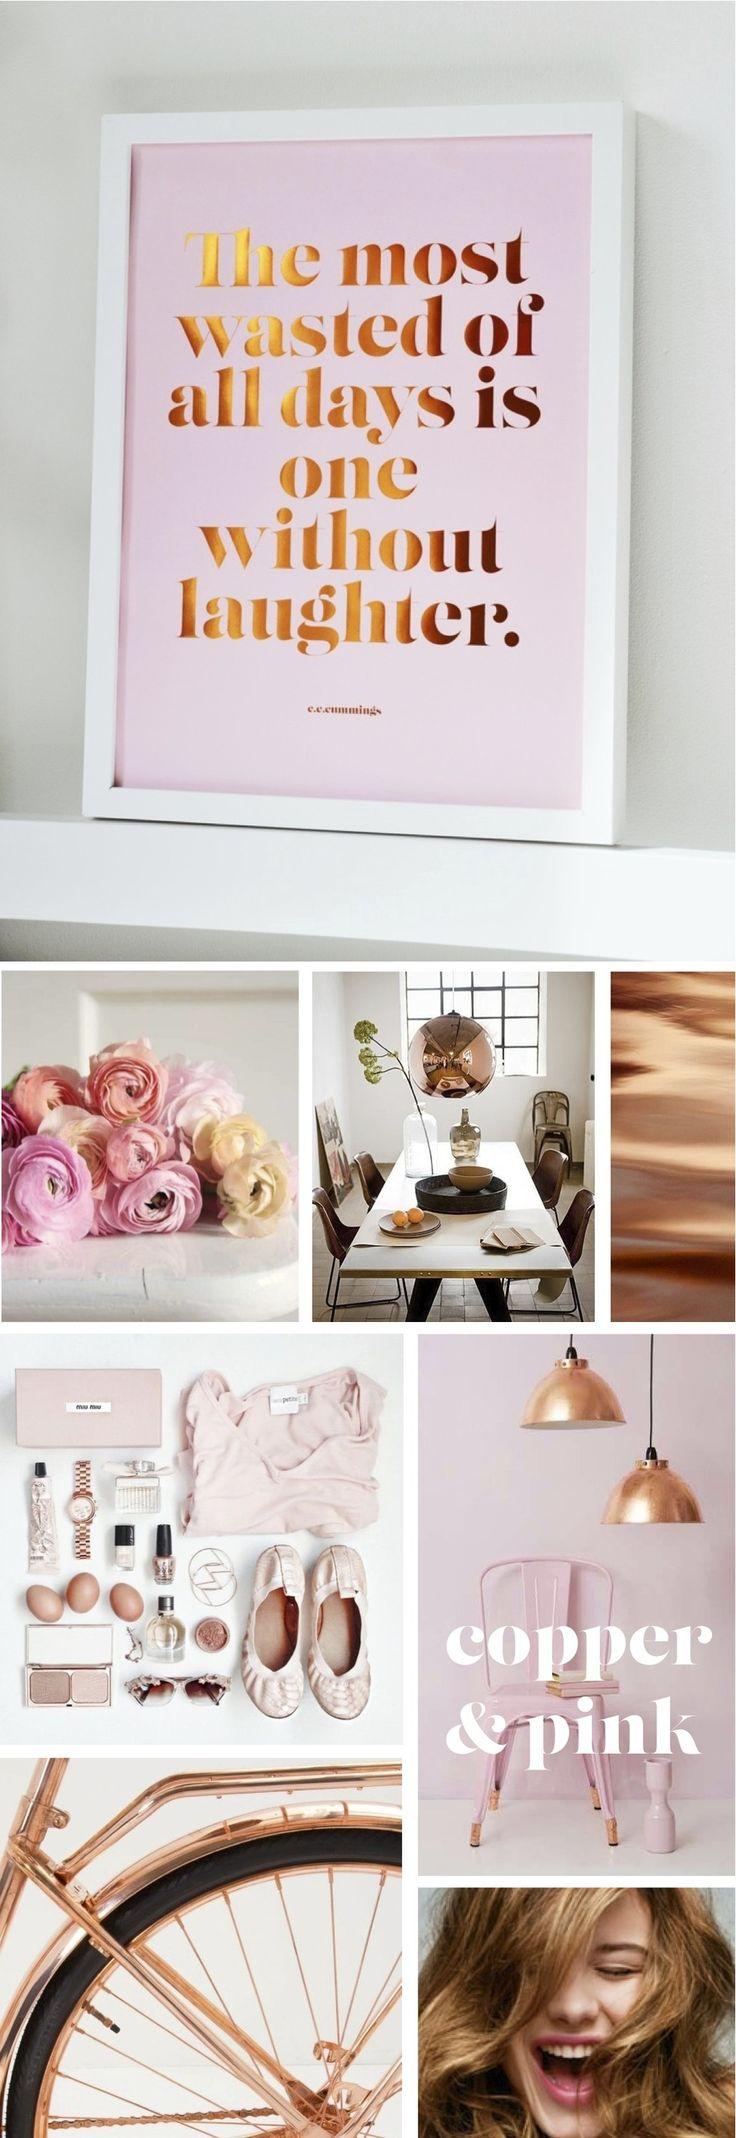 #trending: copper is having a moment. Go copper and pink via @sarahandbendrix